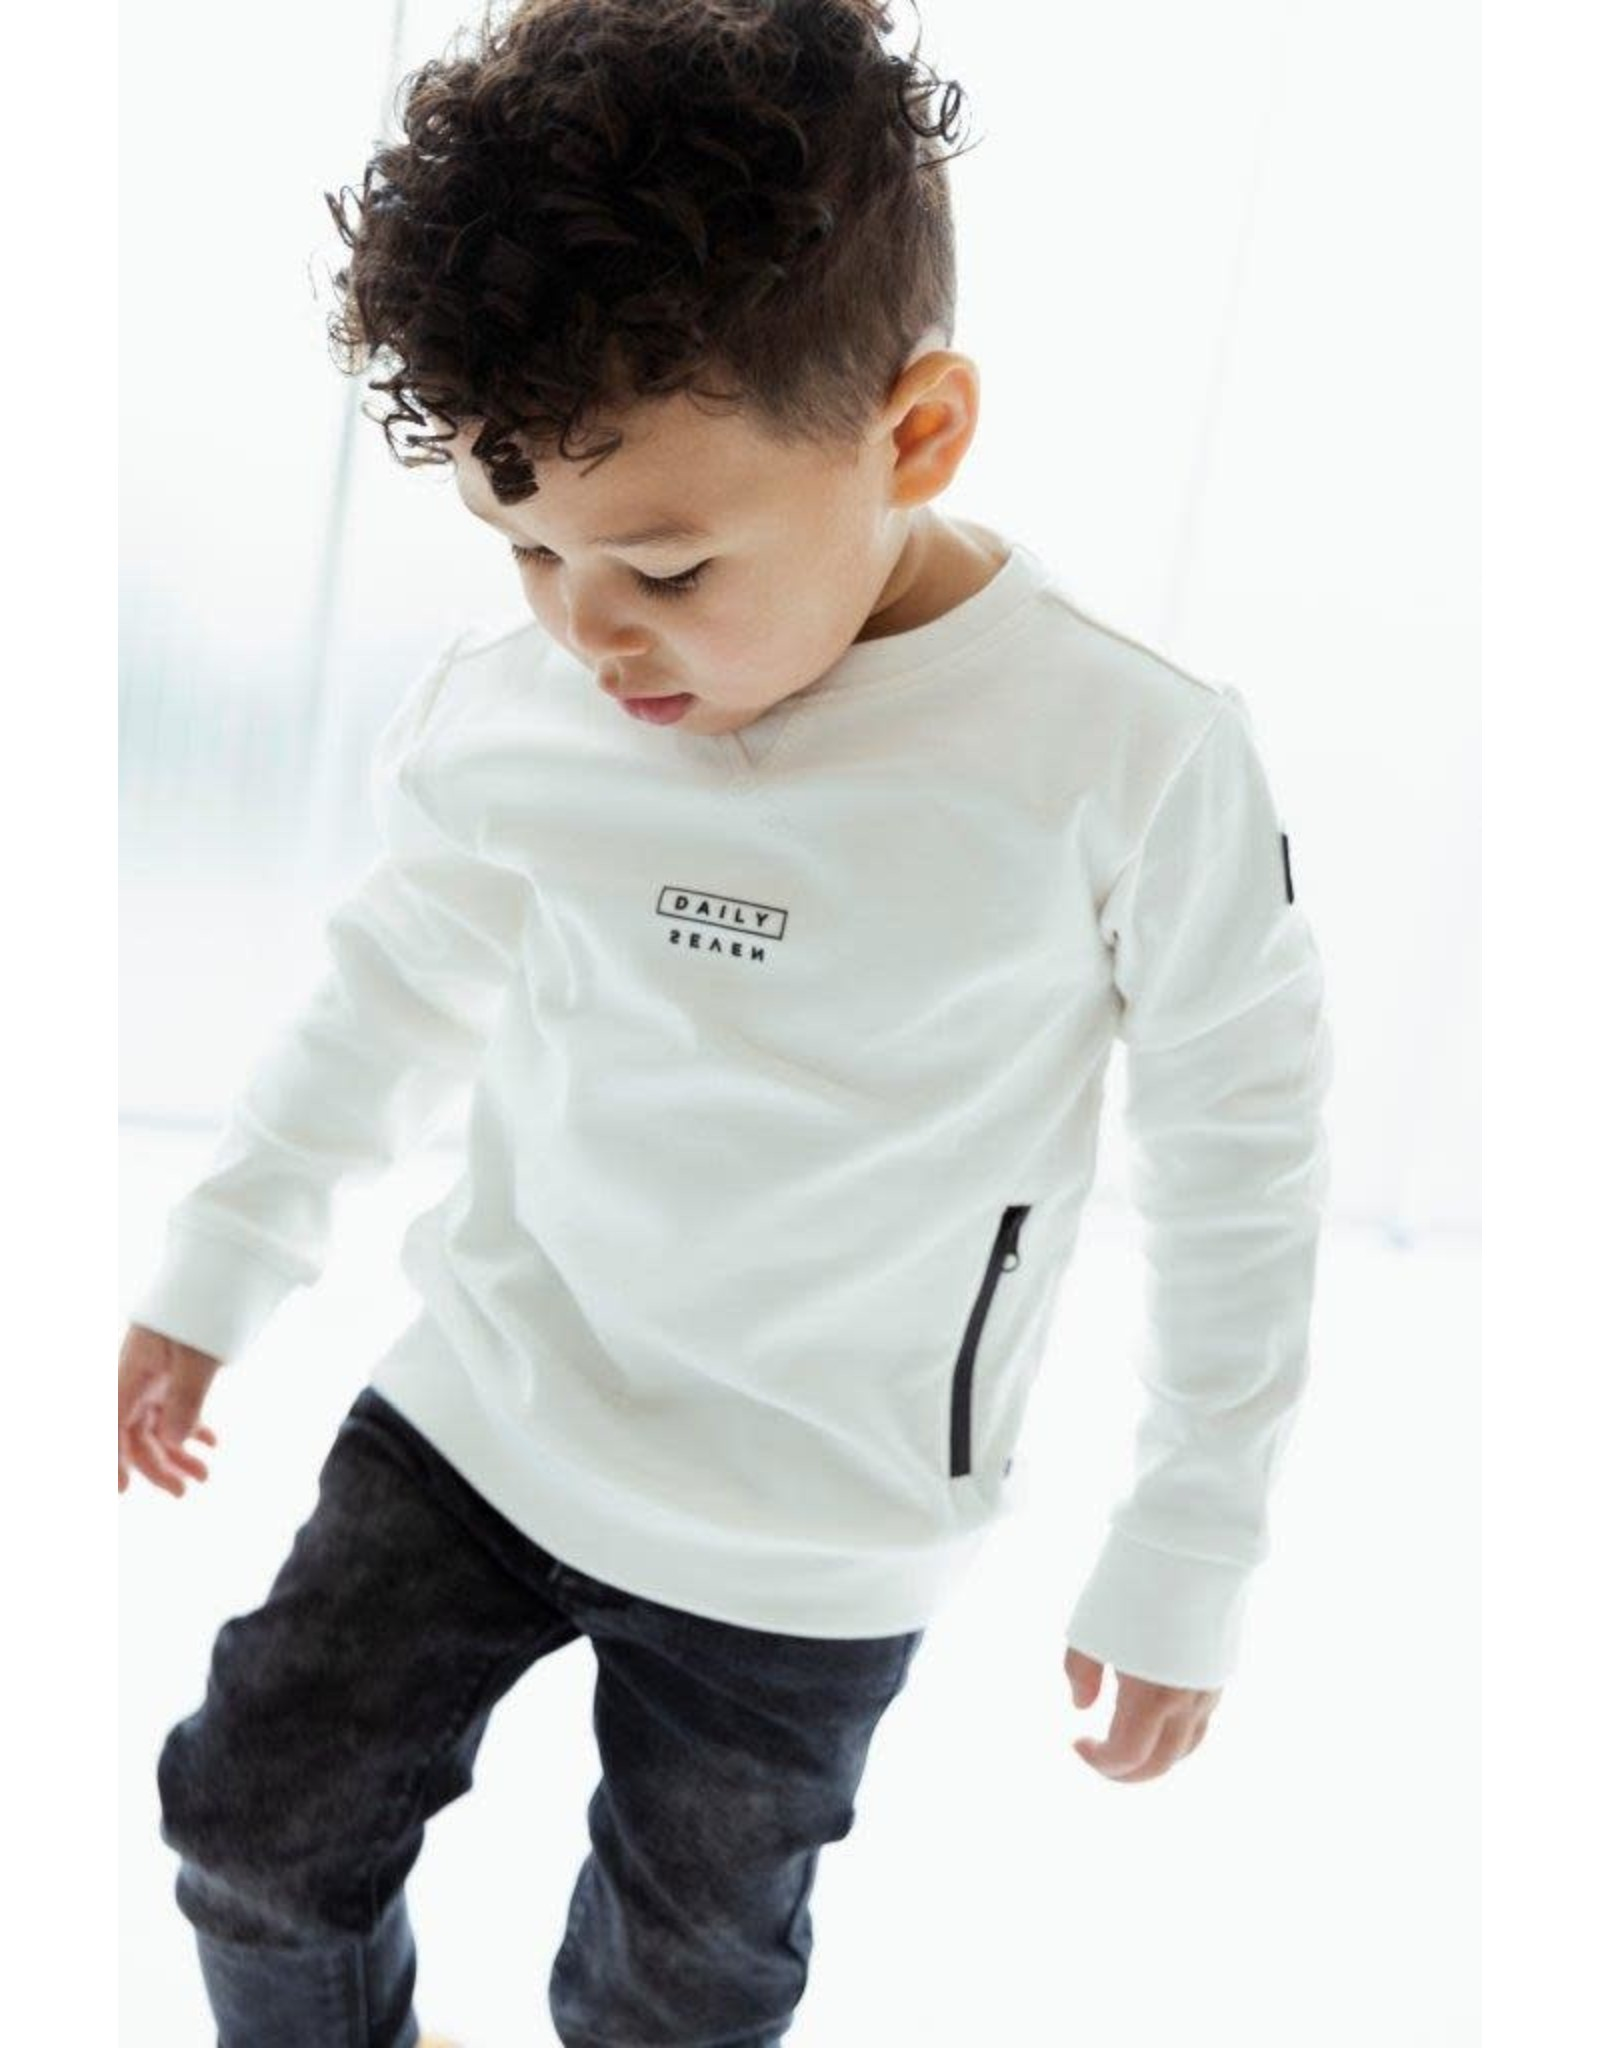 Daily7 Daily7 jongens sweater met rits Off White